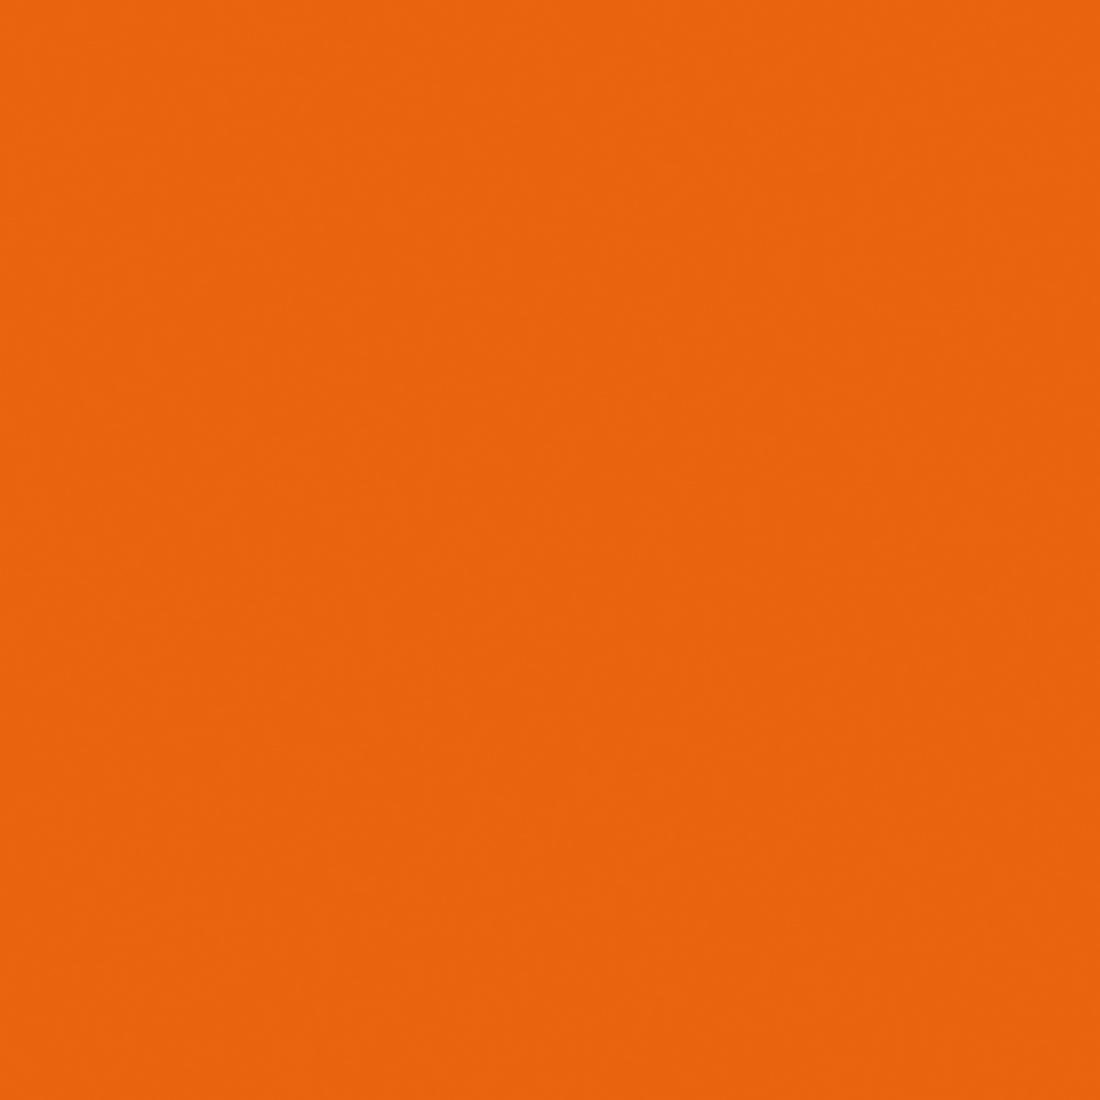 Tabelle-1-Dekor-orangebMI6TR8klFIpd